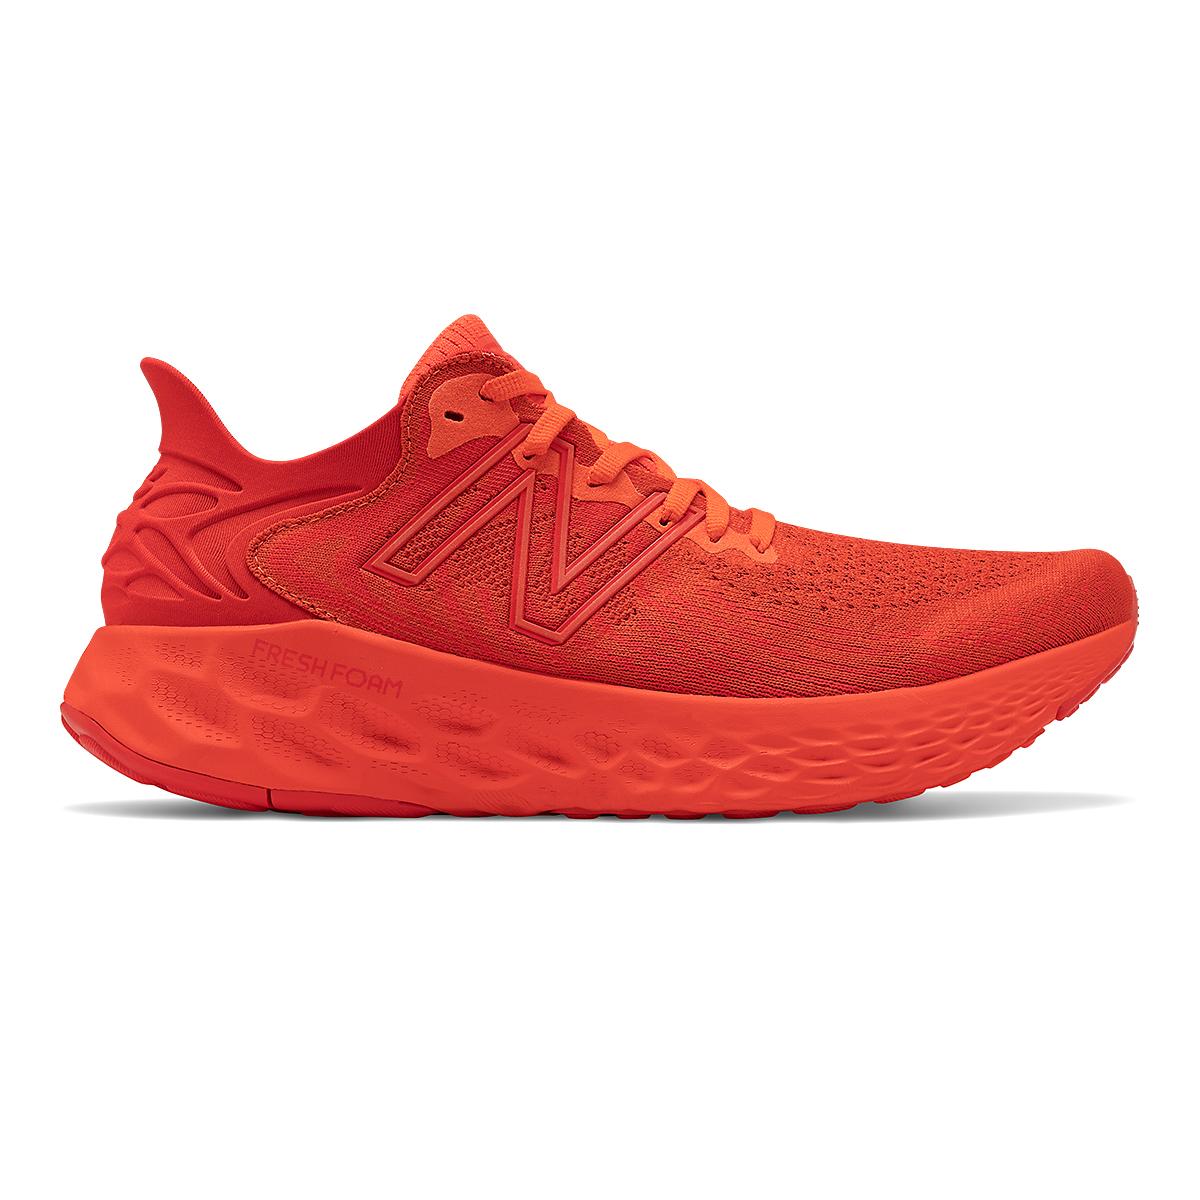 Men's New Balance Fresh Foam 1080V11 Running Shoe - Color: Ghost Pepper/Velocity Red - Size: 6 - Width: Wide, Ghost Pepper/Velocity Red, large, image 1